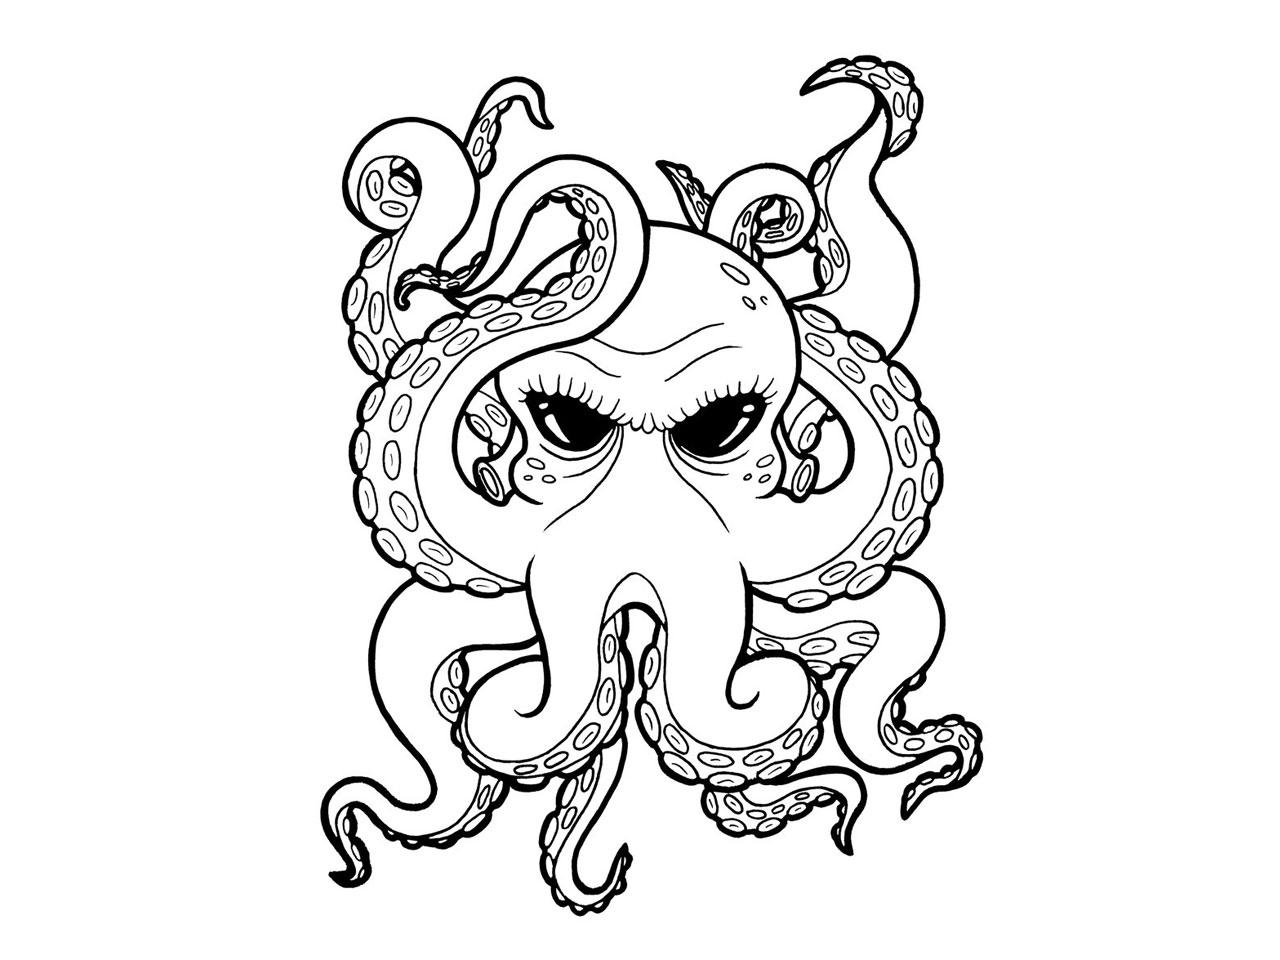 1280x960 Cartoon Black Eyes Octopus Tattoo